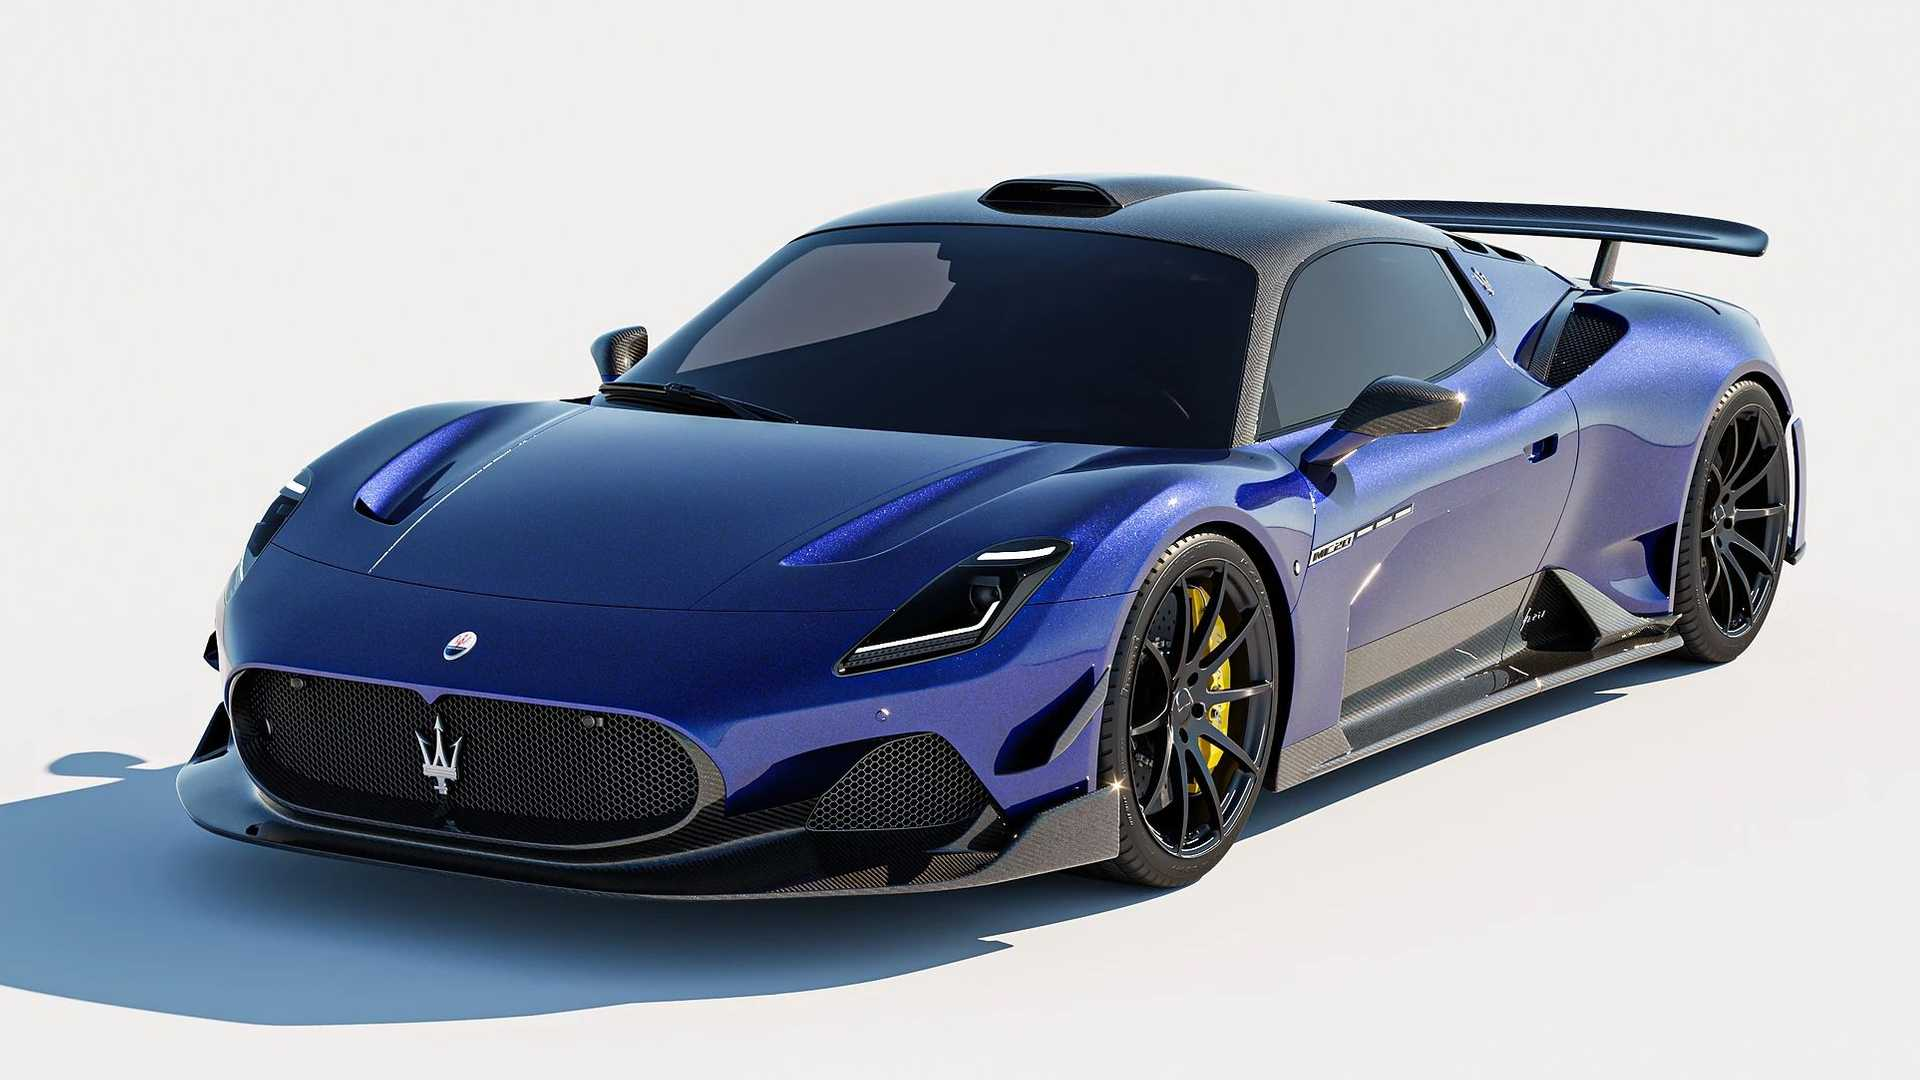 Maserati-MC20-bodykit-by-7-Designs-1